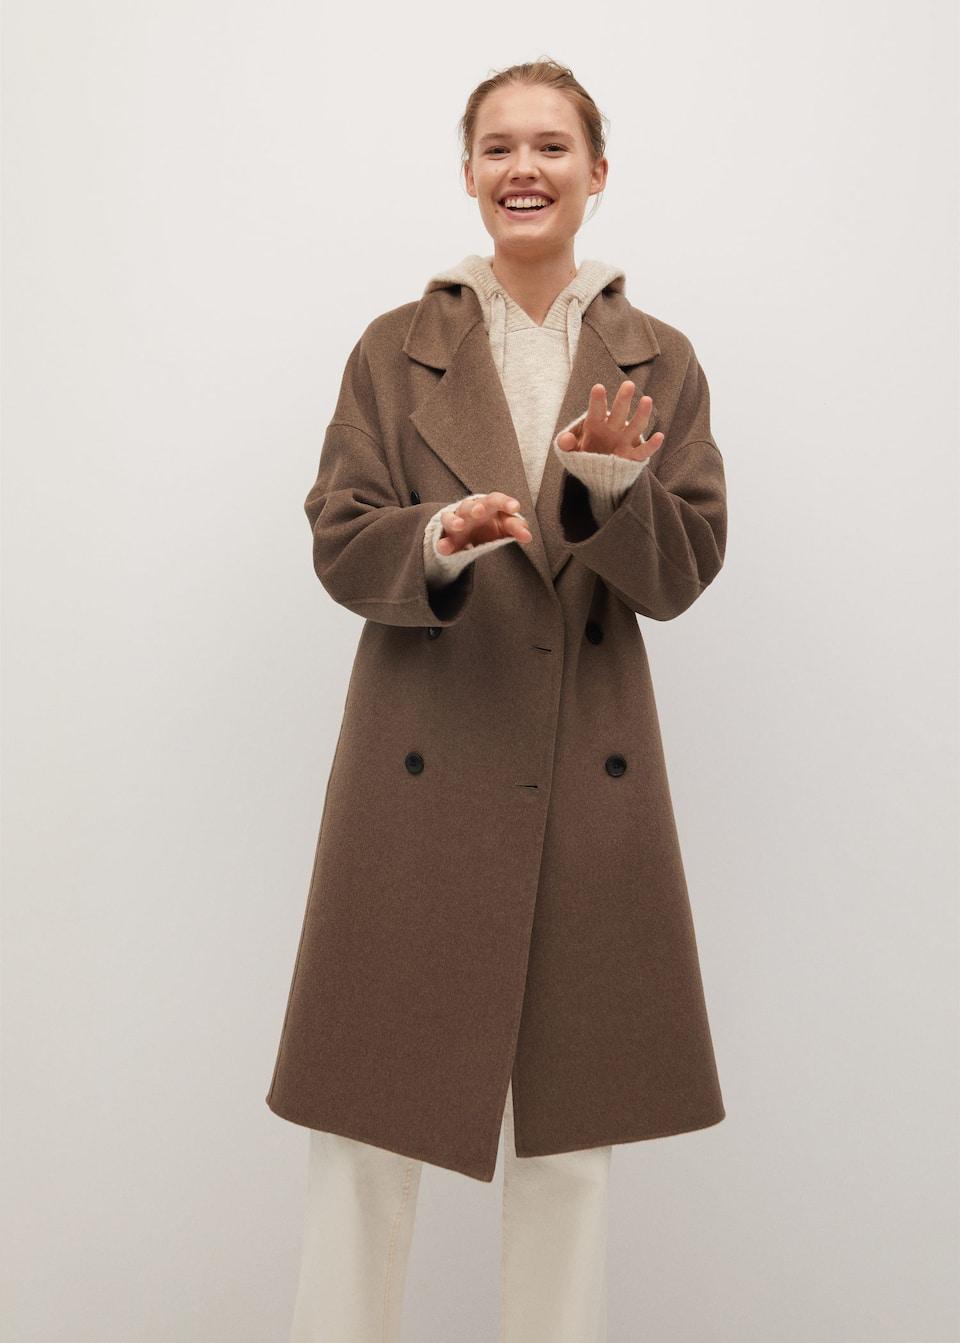 Handmade wool coat - Medium plane